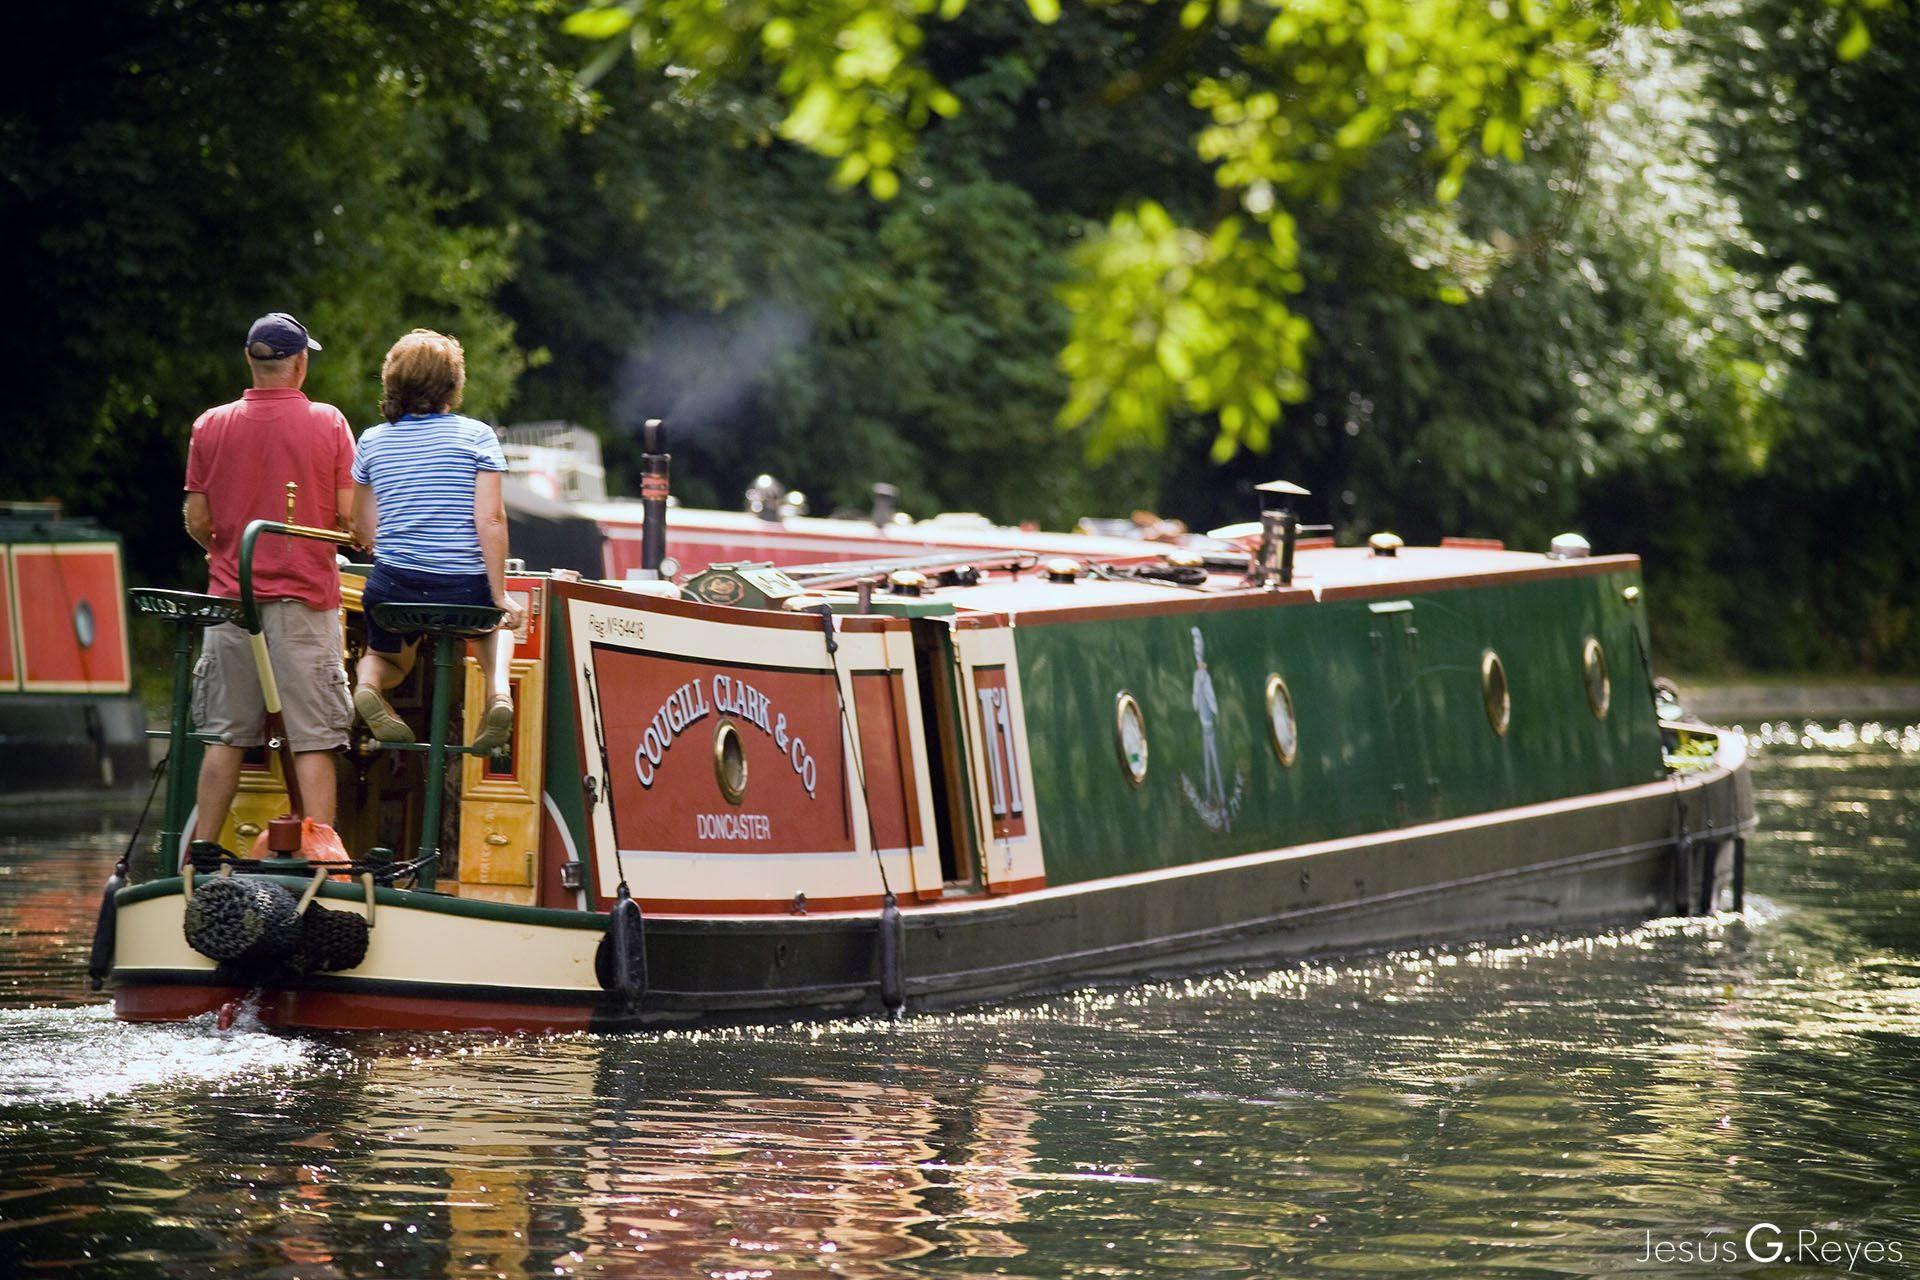 Grand Union Canal. London